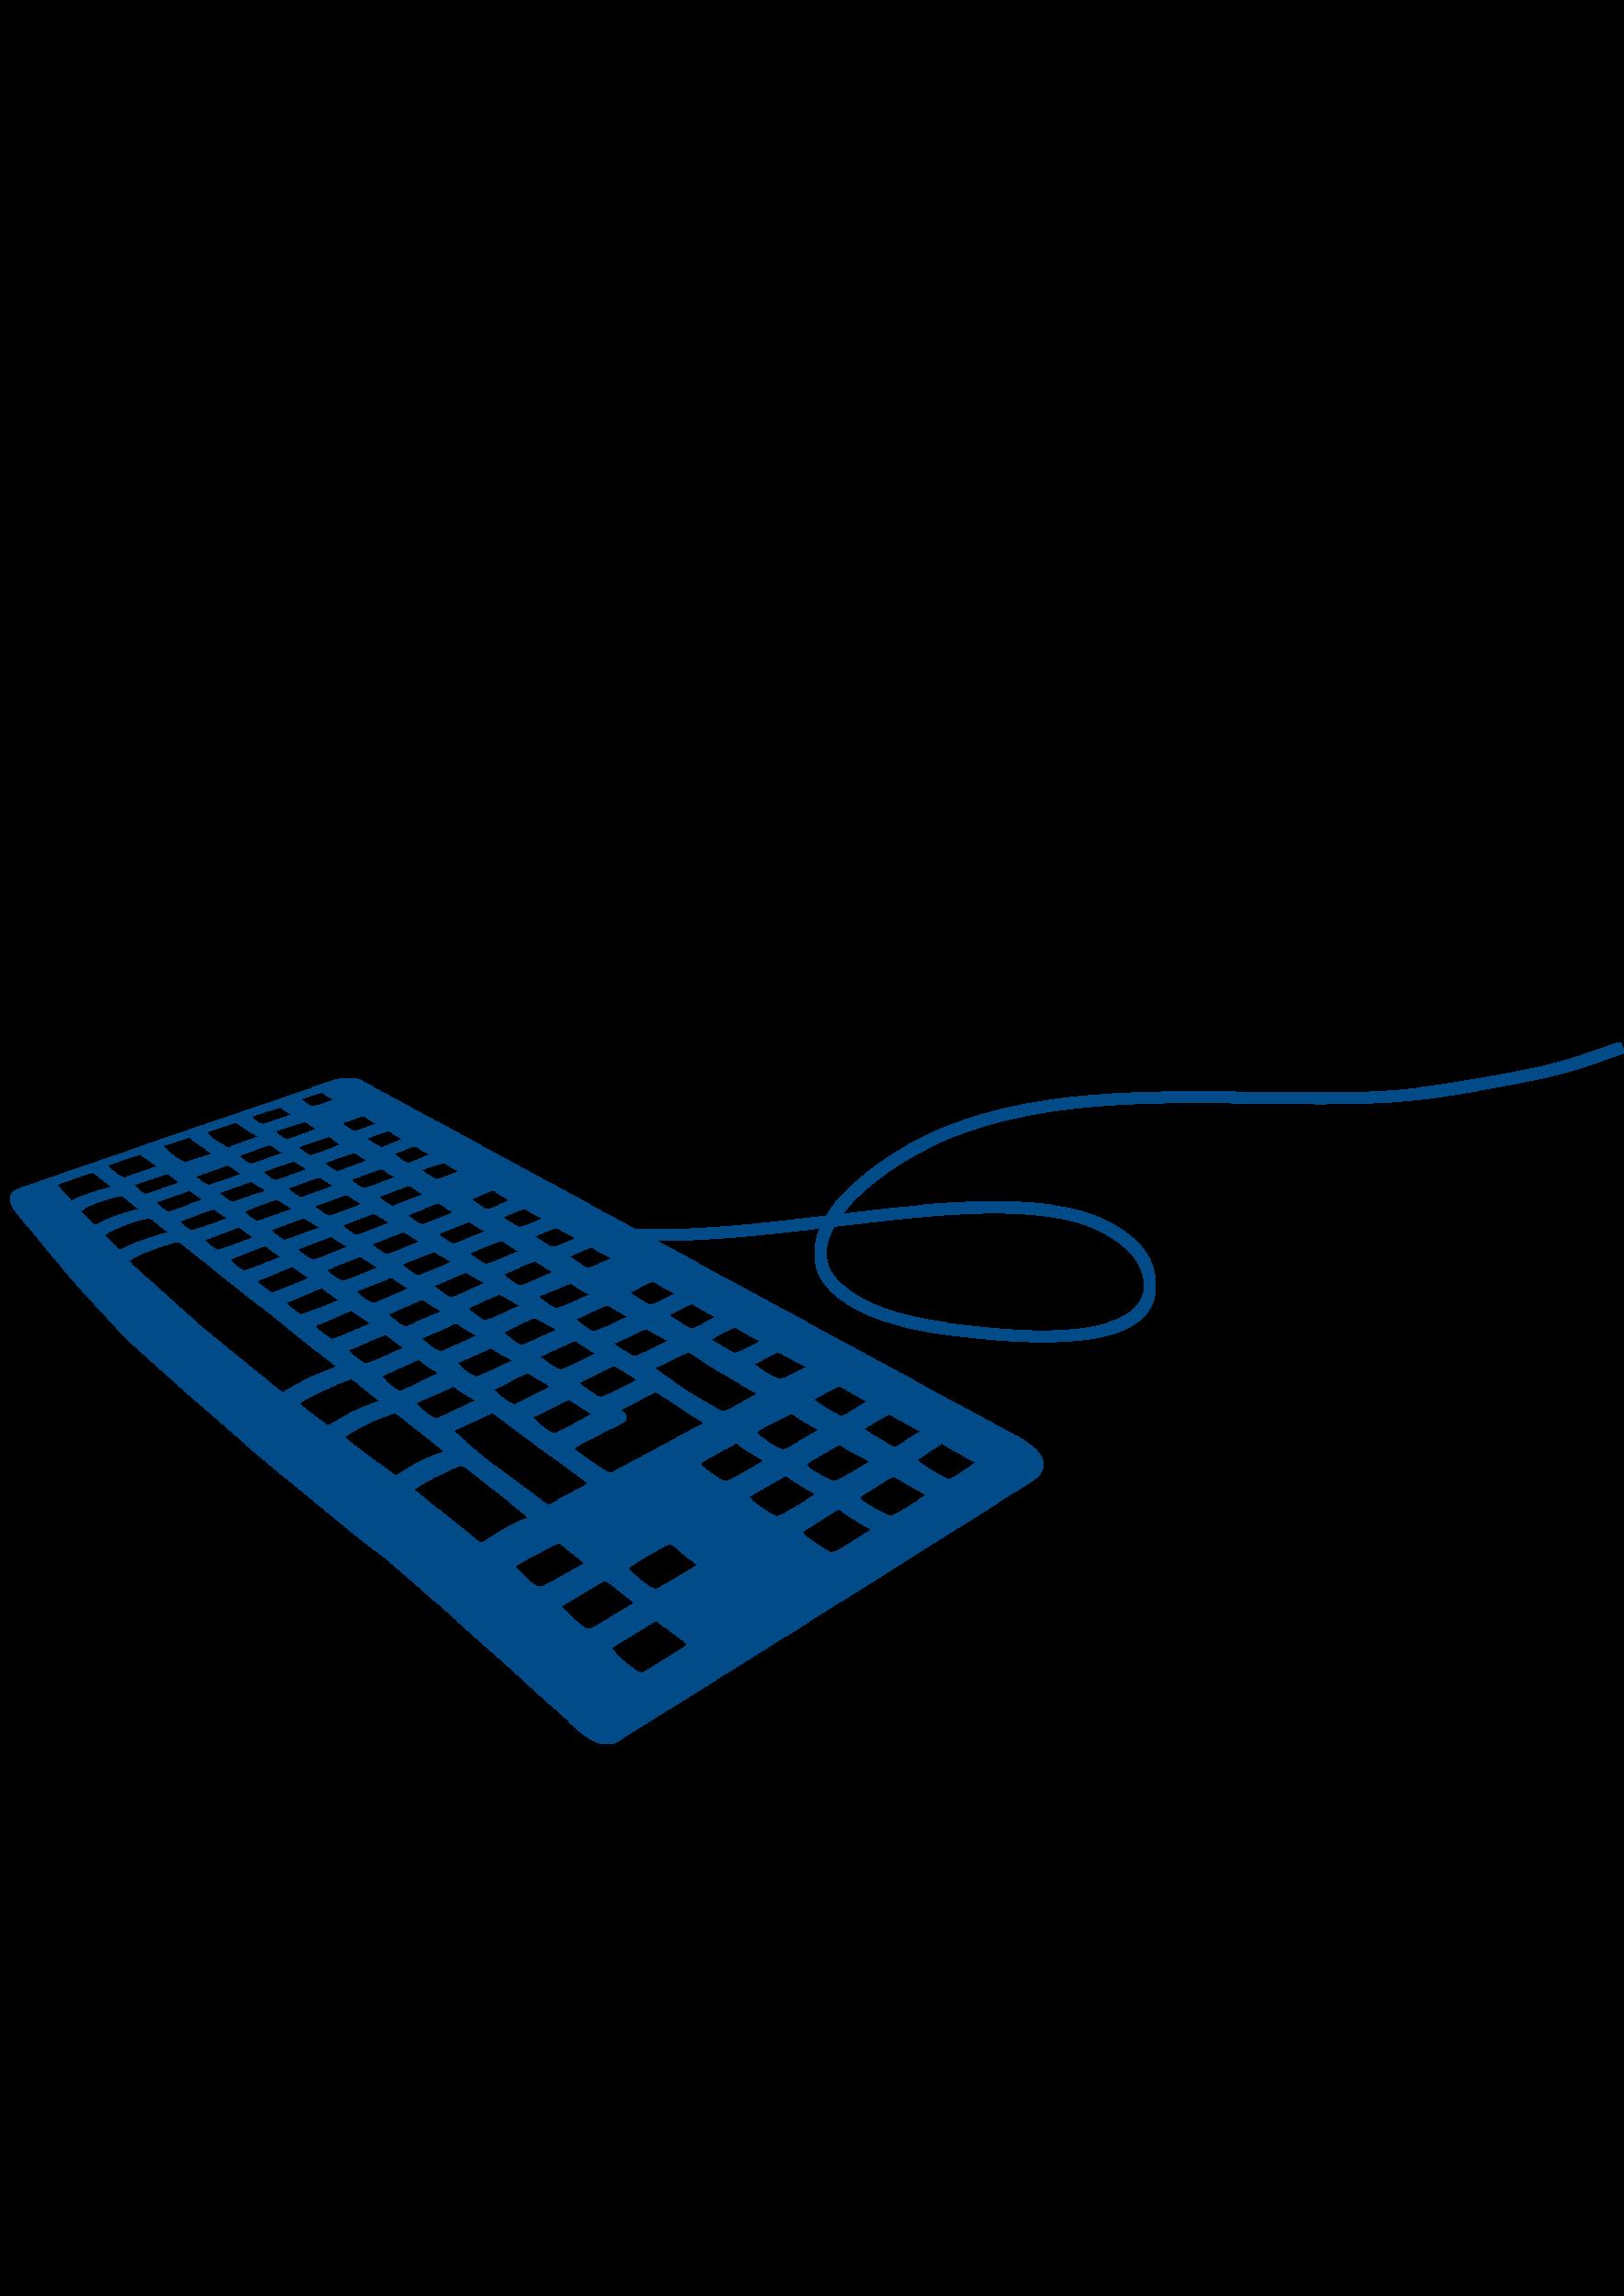 keyboard_heritageblue.png